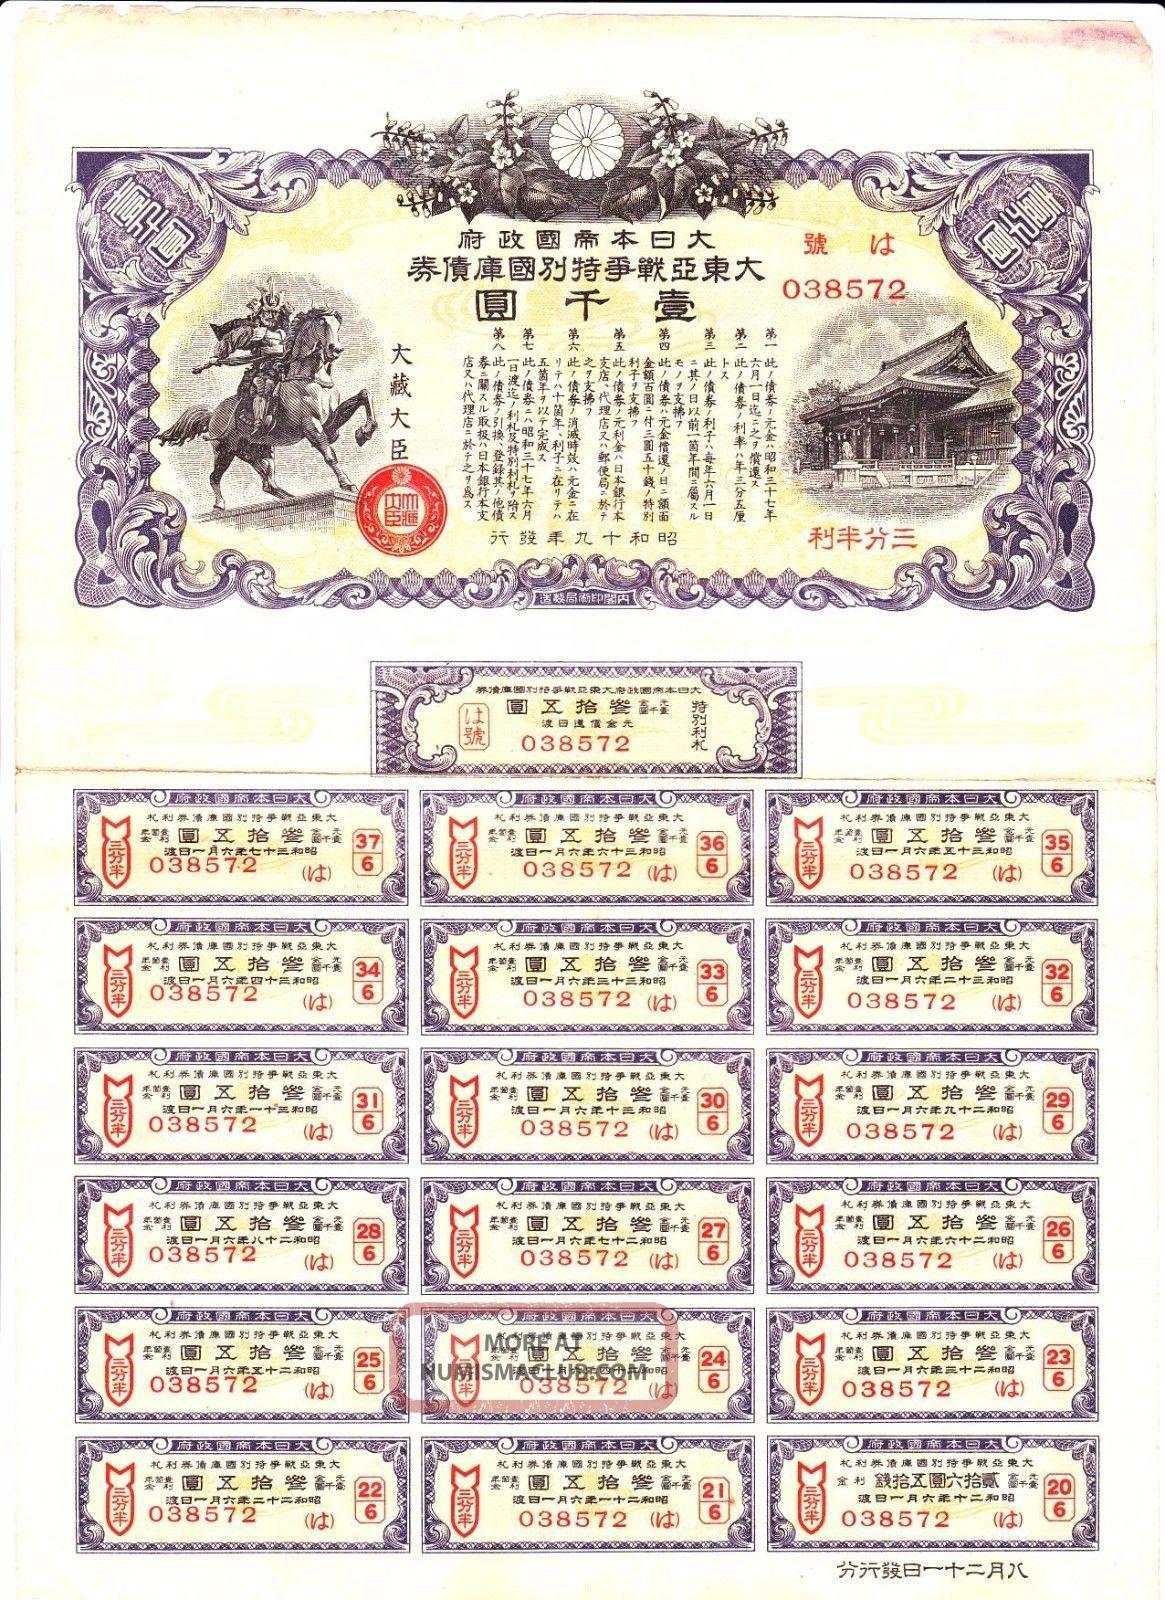 B2585,  Greater East Asia War Special Bond,  1000 Yen,  1944 Wwii Stocks & Bonds, Scripophily photo